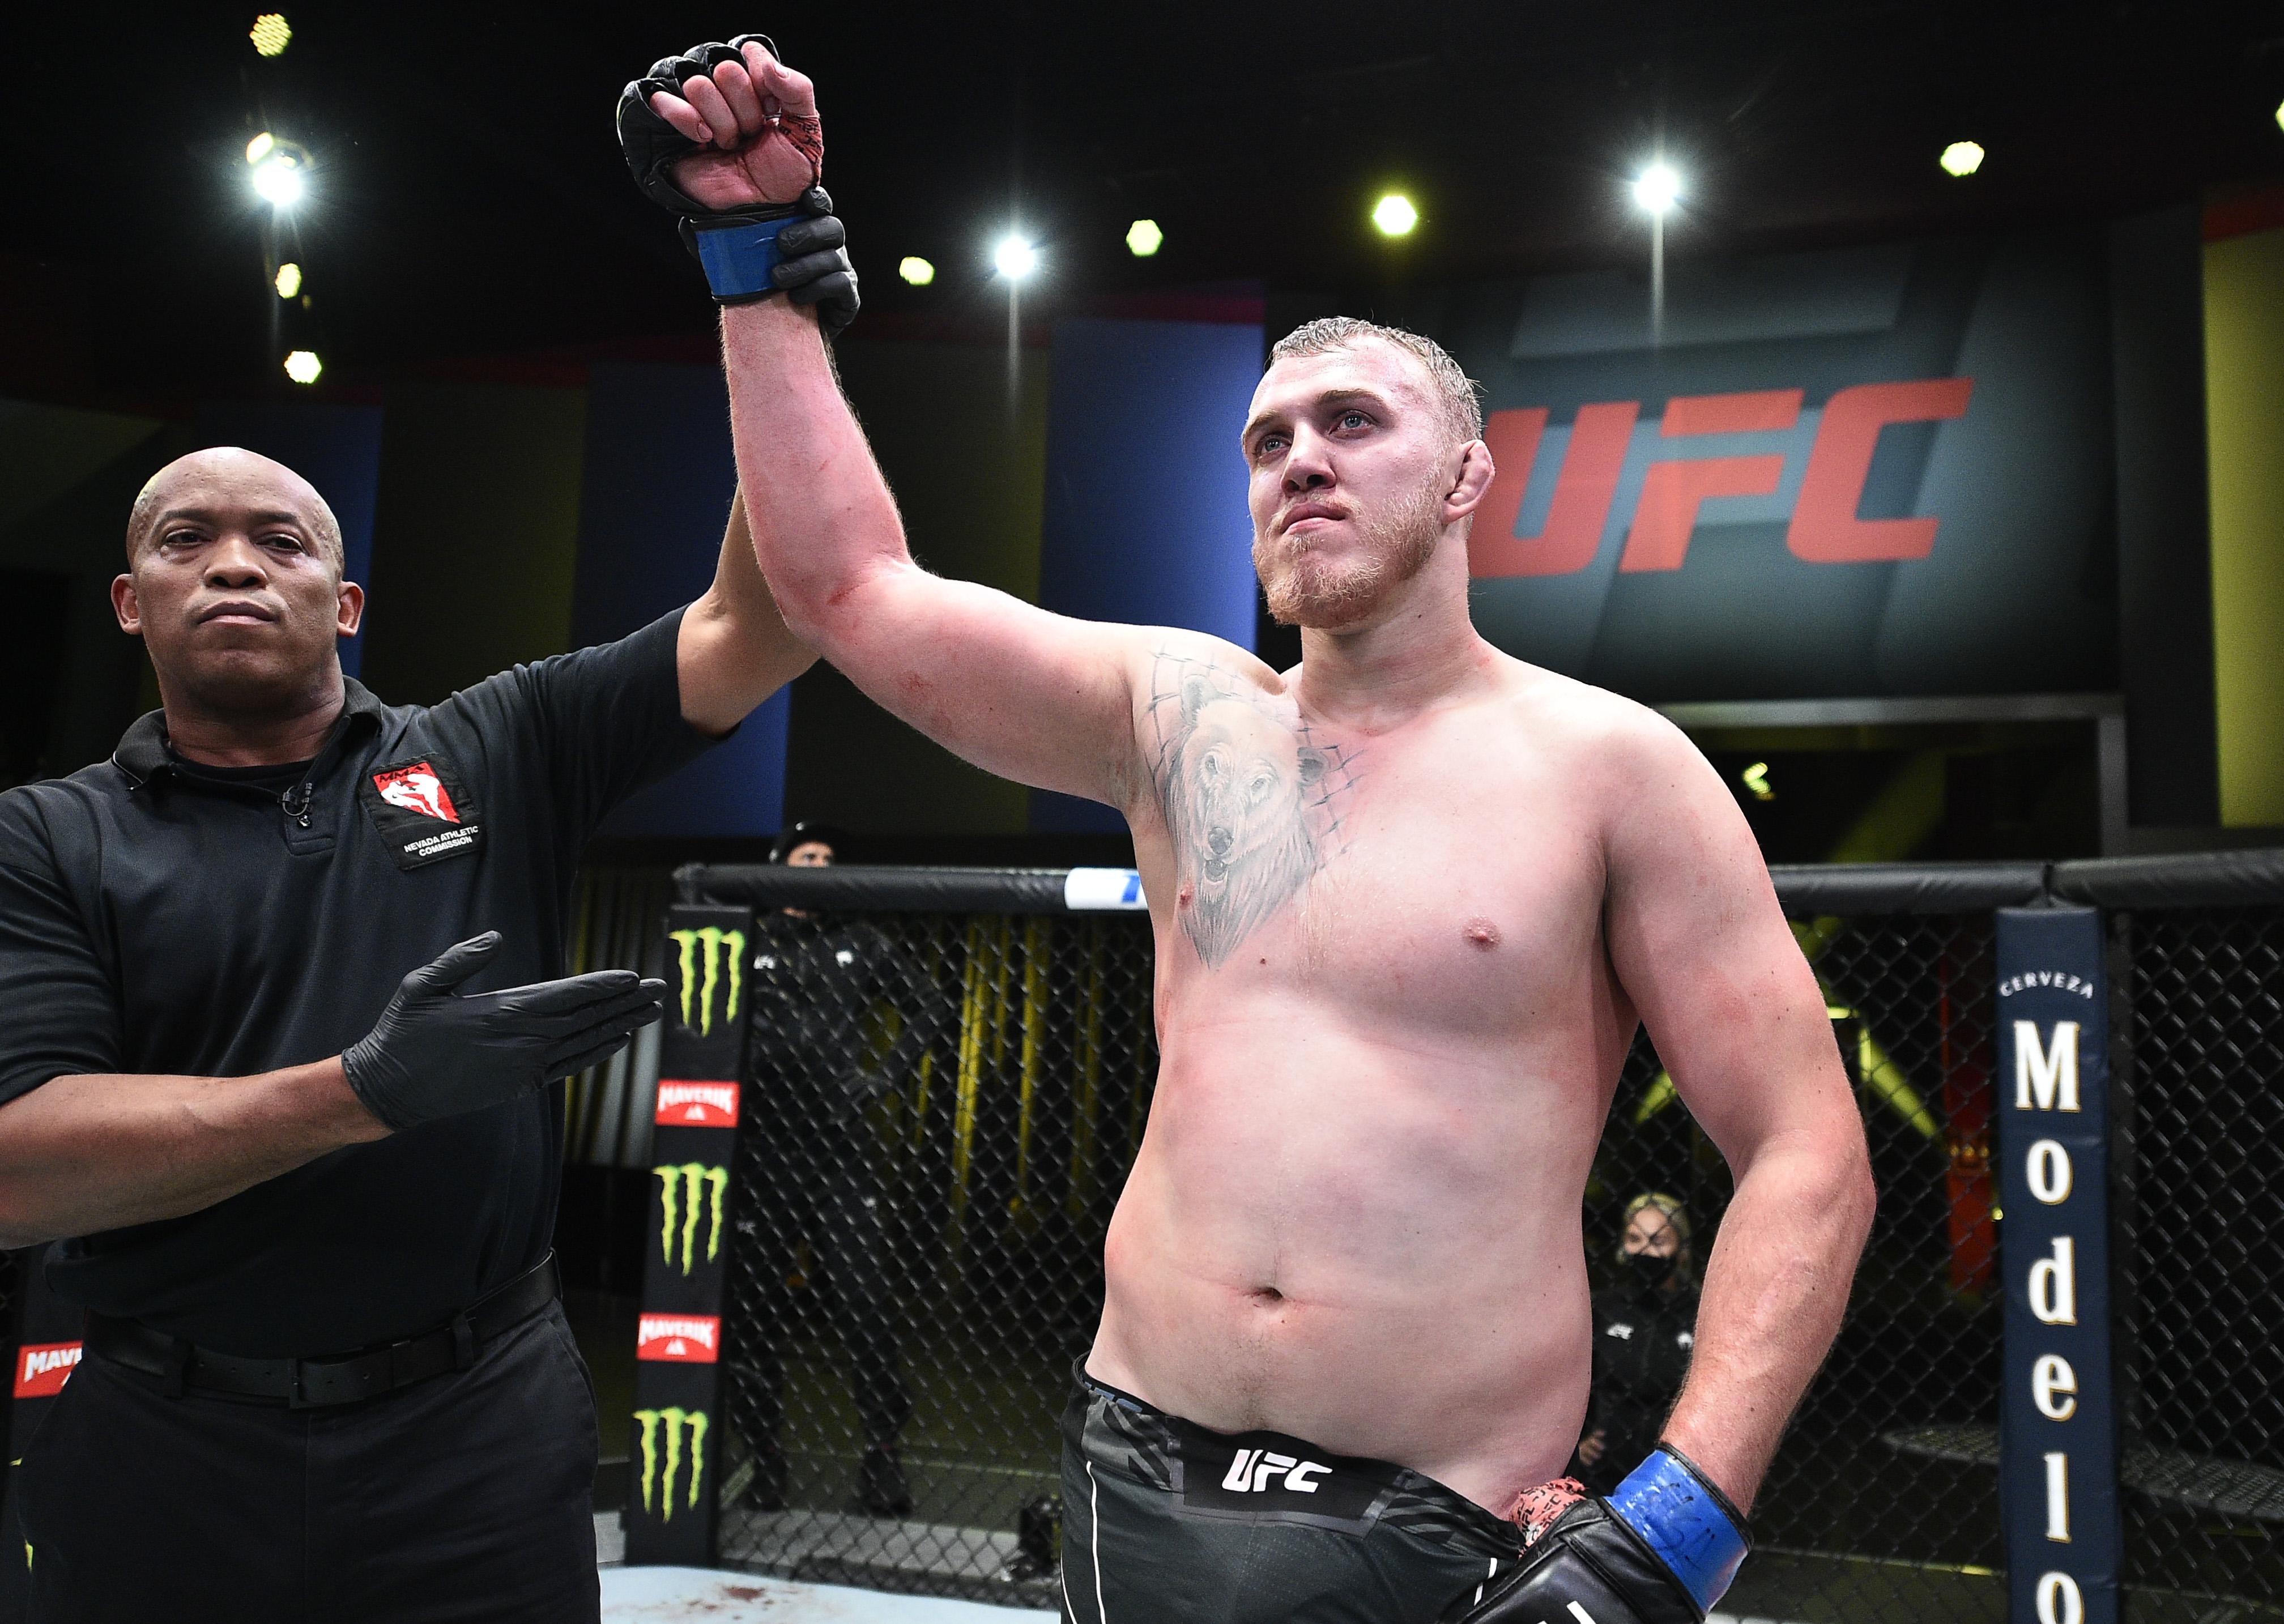 UFC Fight Night: Oleinik v Spivac